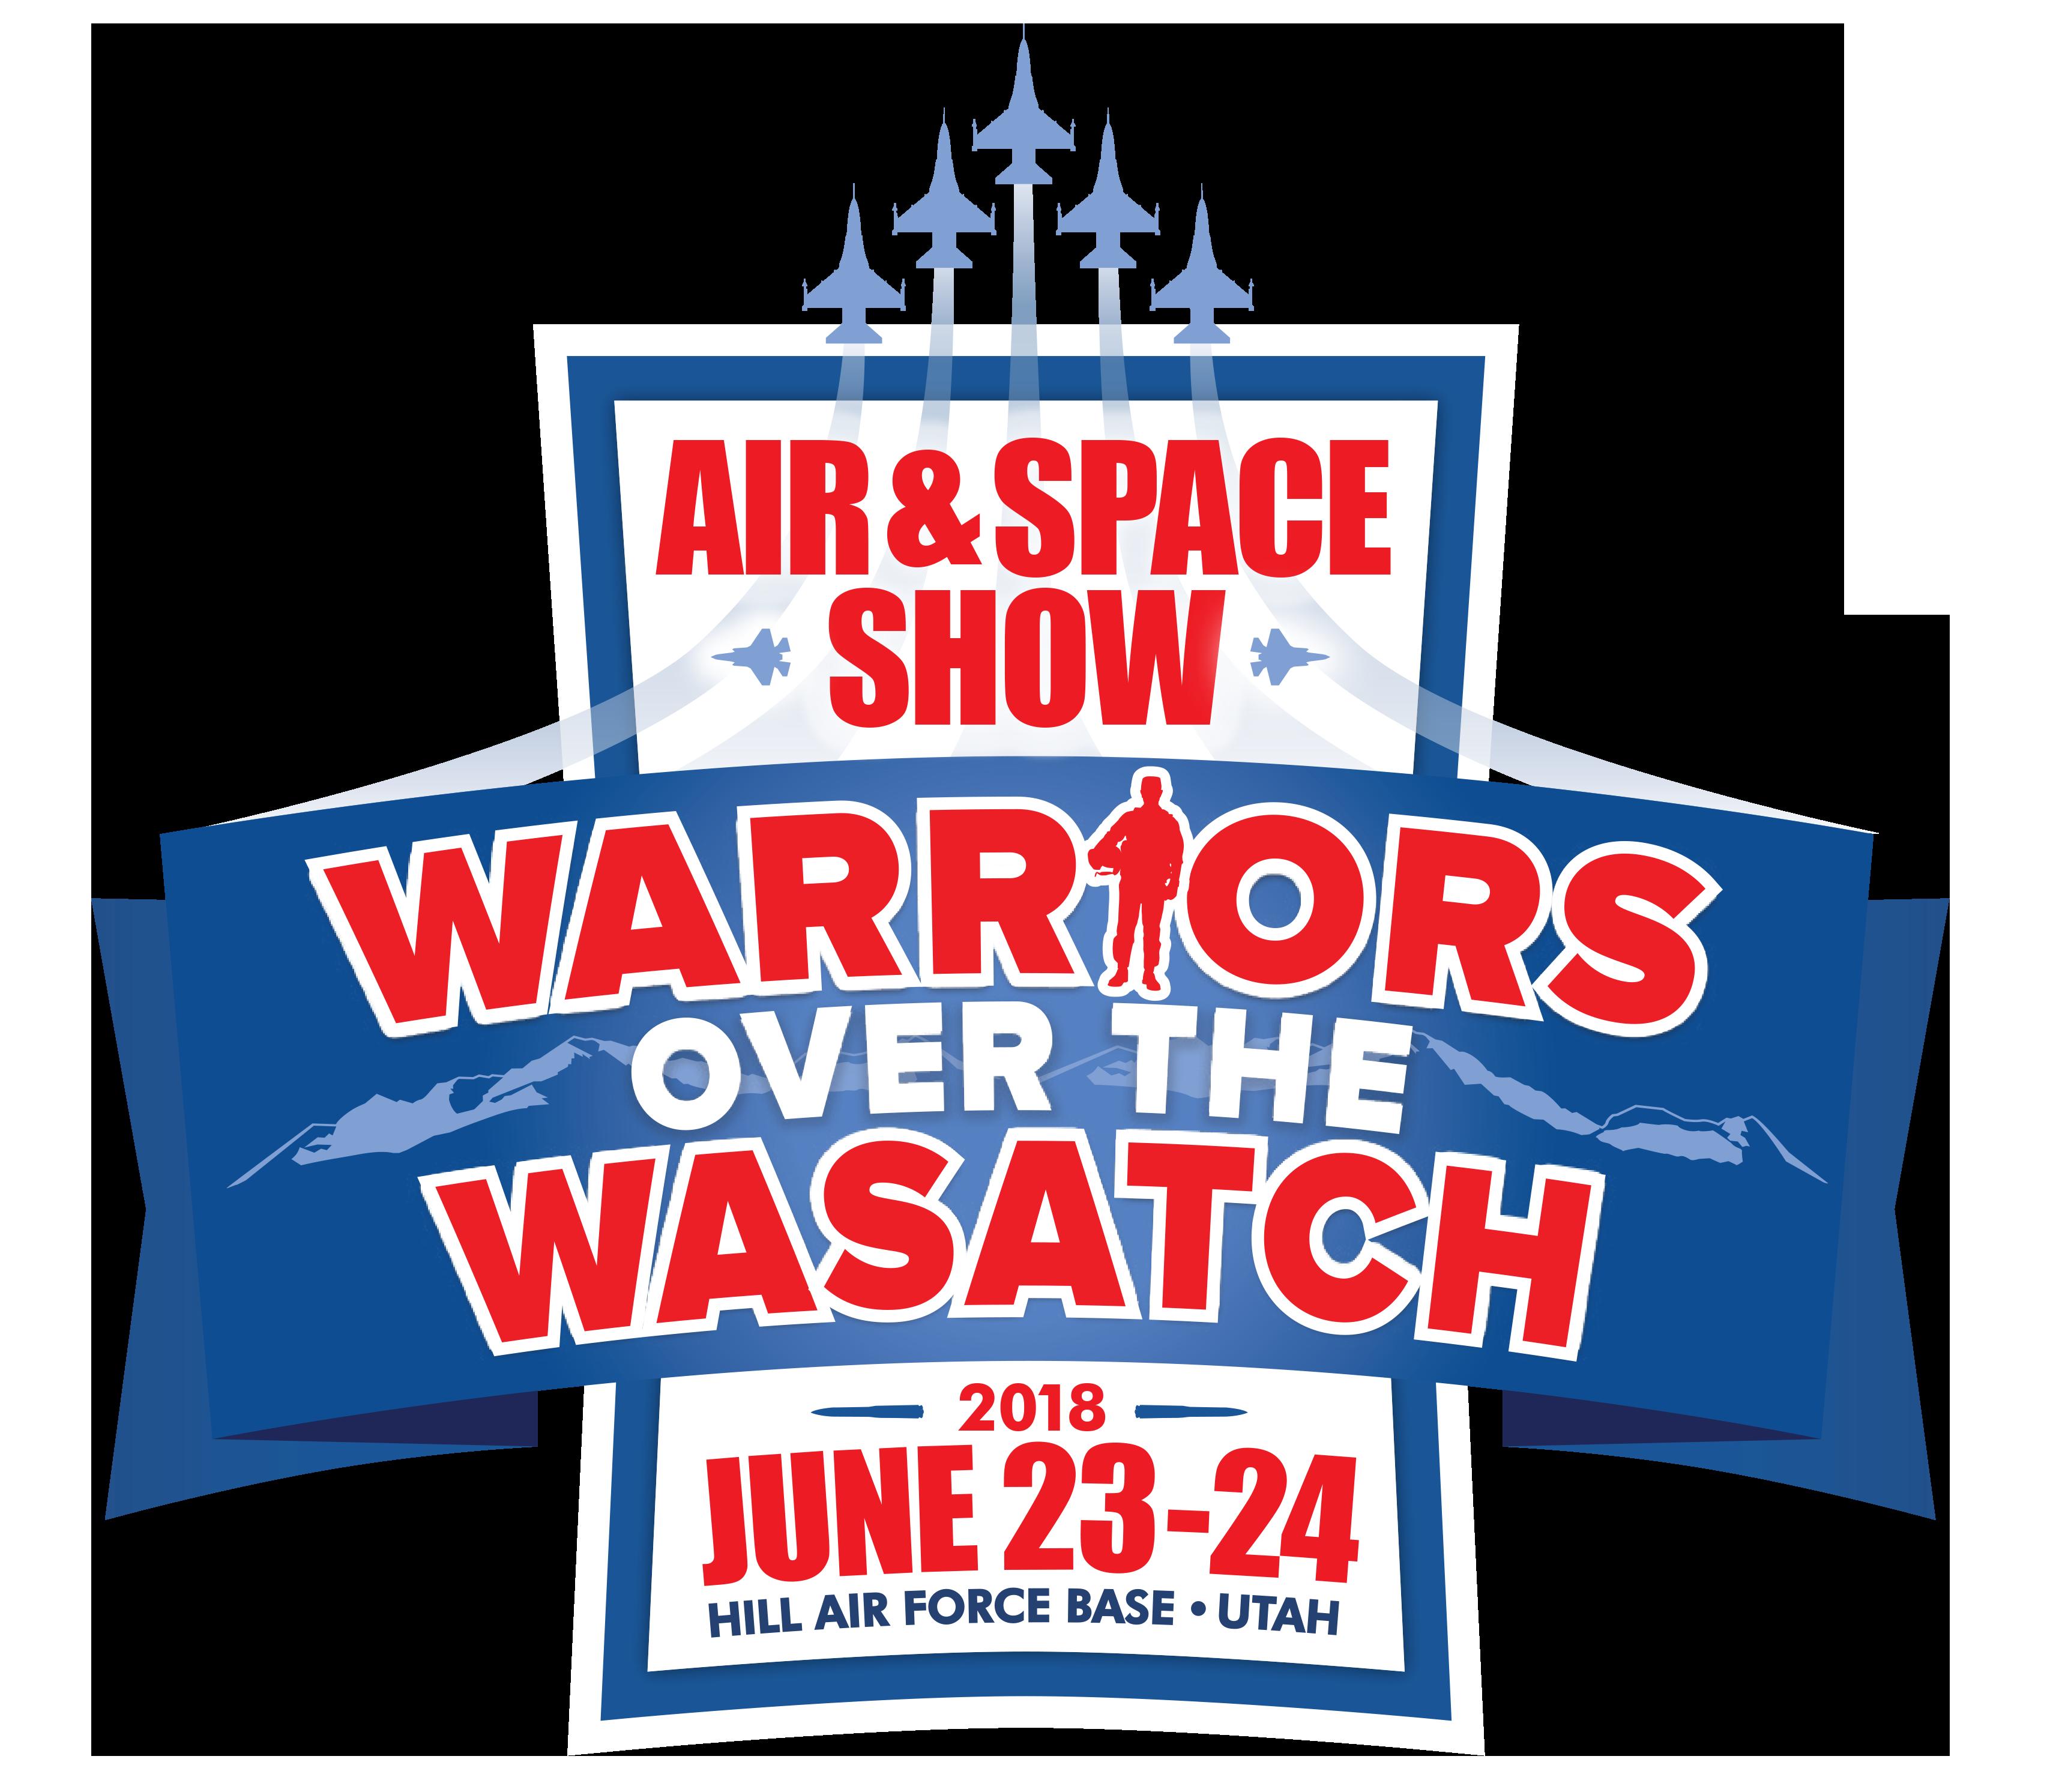 Warriors Over Wasatch 2018 Logo June 23 - 24 Hill Air Force Base Utah